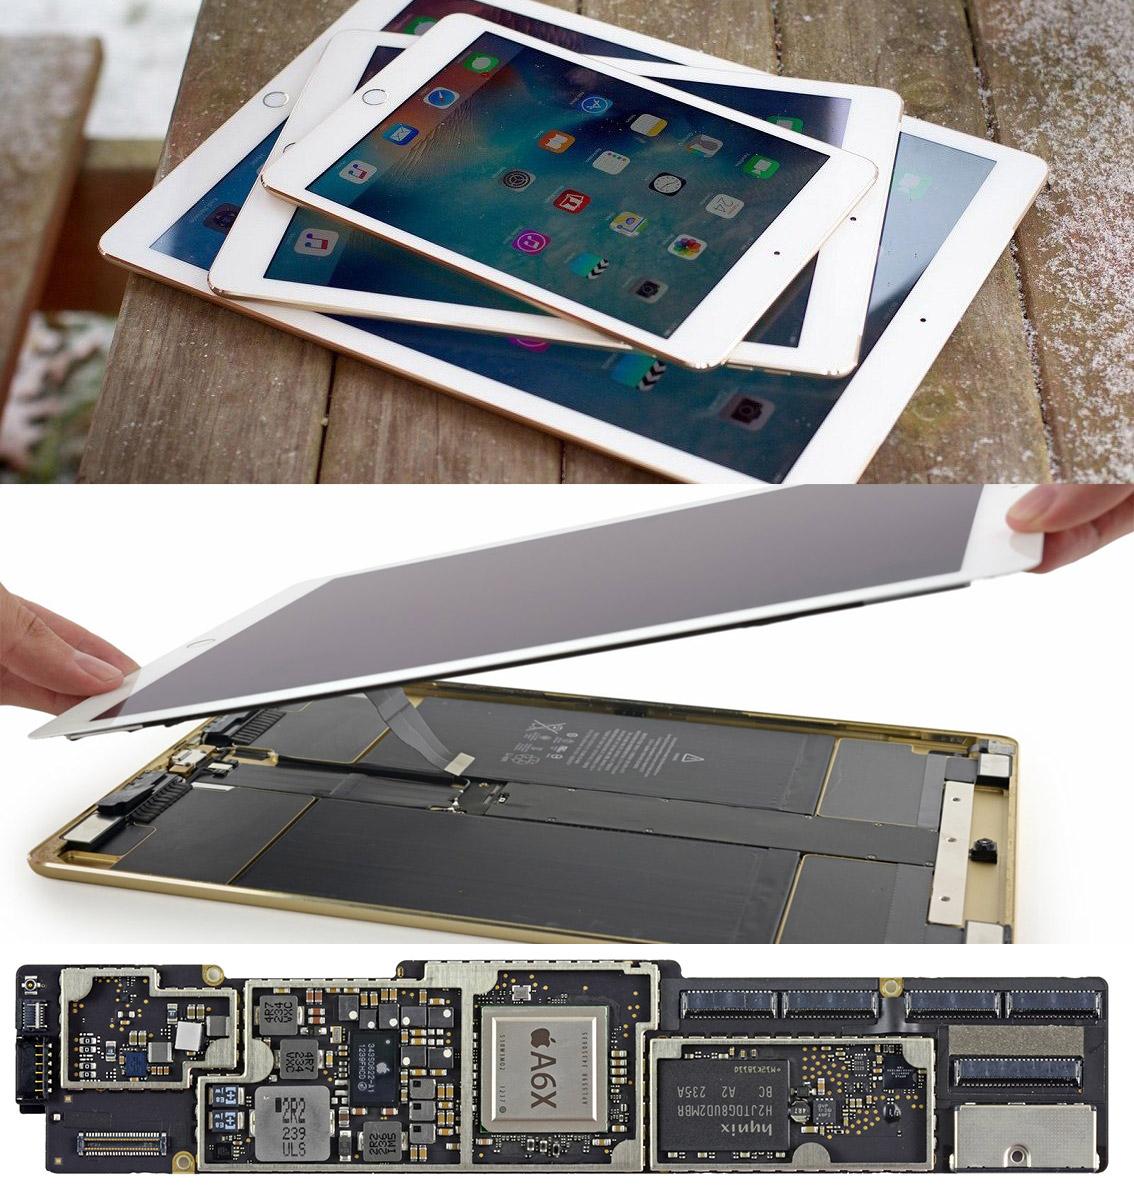 Reparo de iPad no Rio de Janeiro